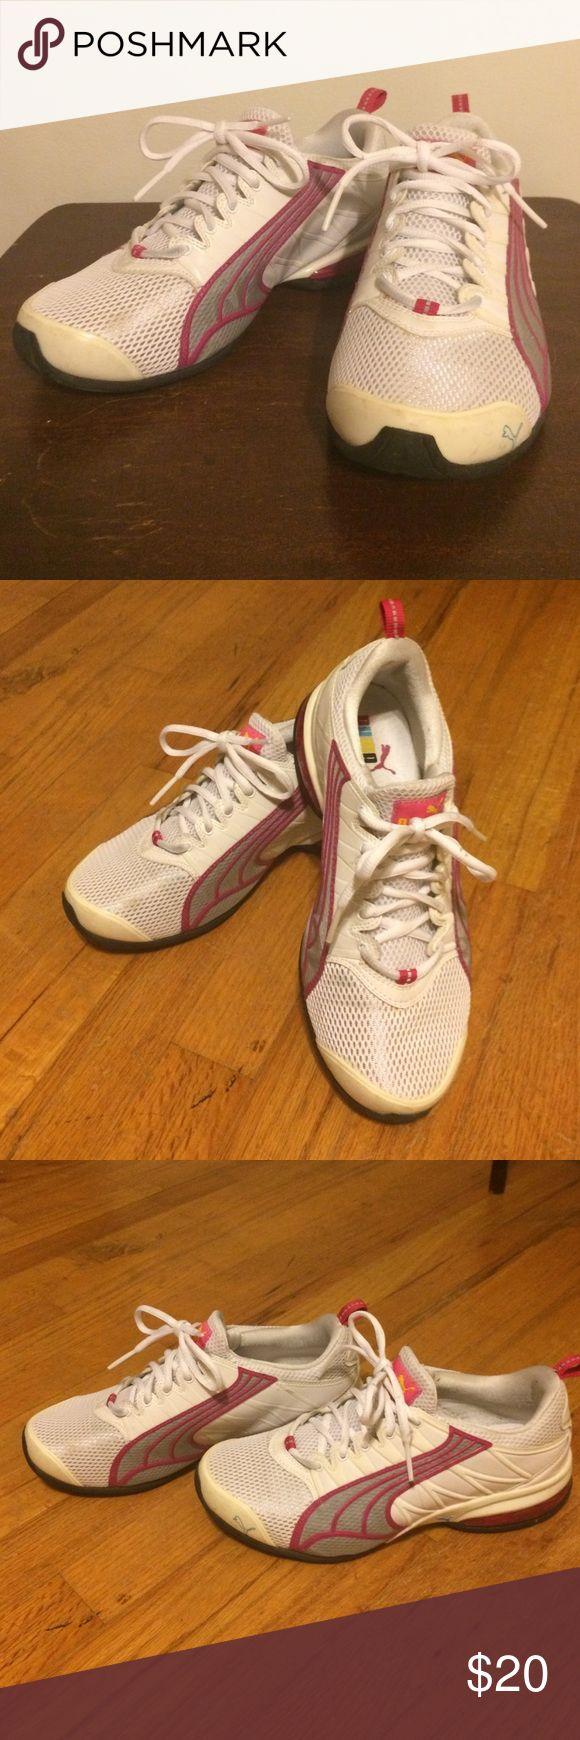 Puma tennis shoes Pink and white puma tennis shoes Puma Shoes Sneakers